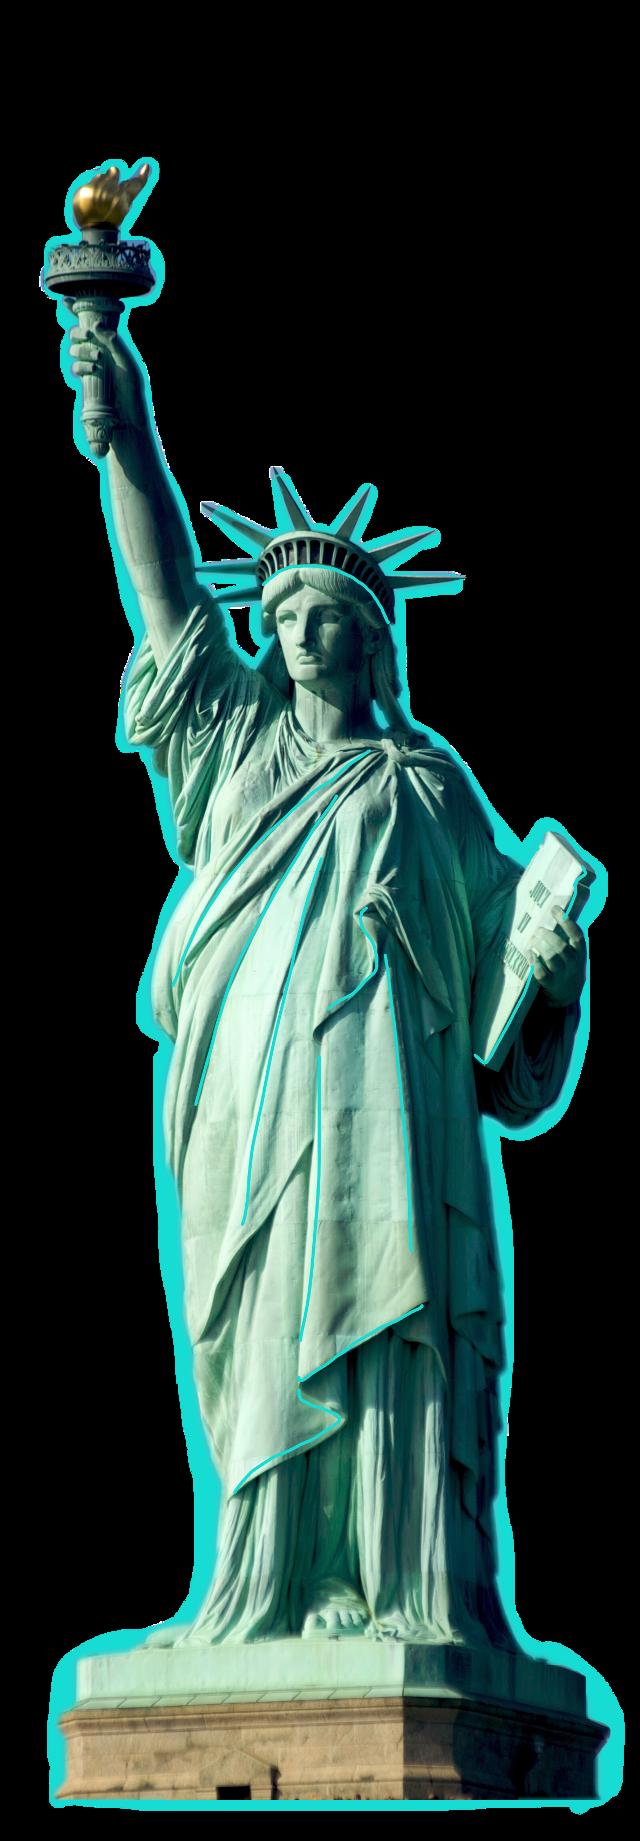 #freetoedit #ftestickers #building #Statue #Statueofliberty#FreeToEdit